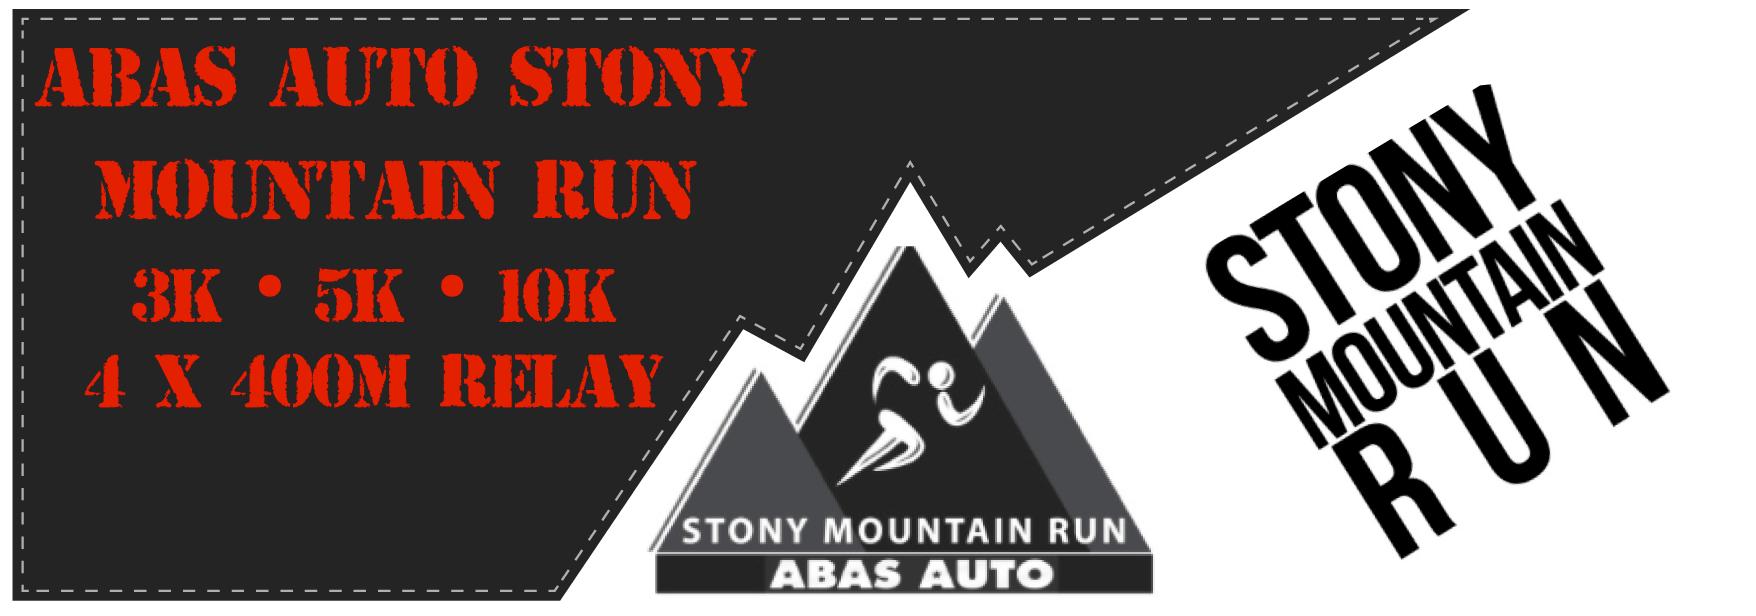 manitoba-runners-association-stony-mountain